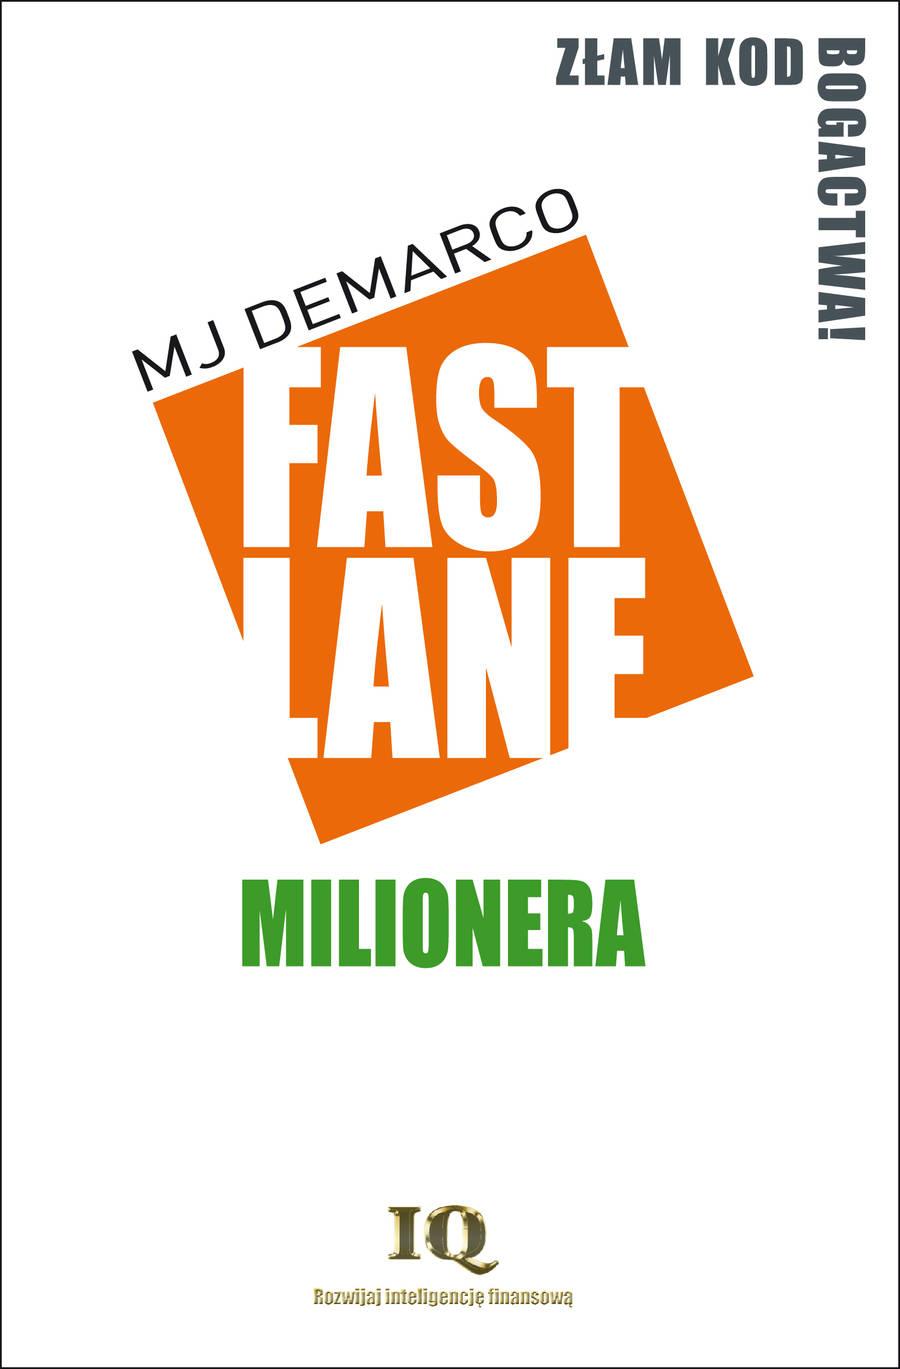 Fastlane milionera – MJ Demarco